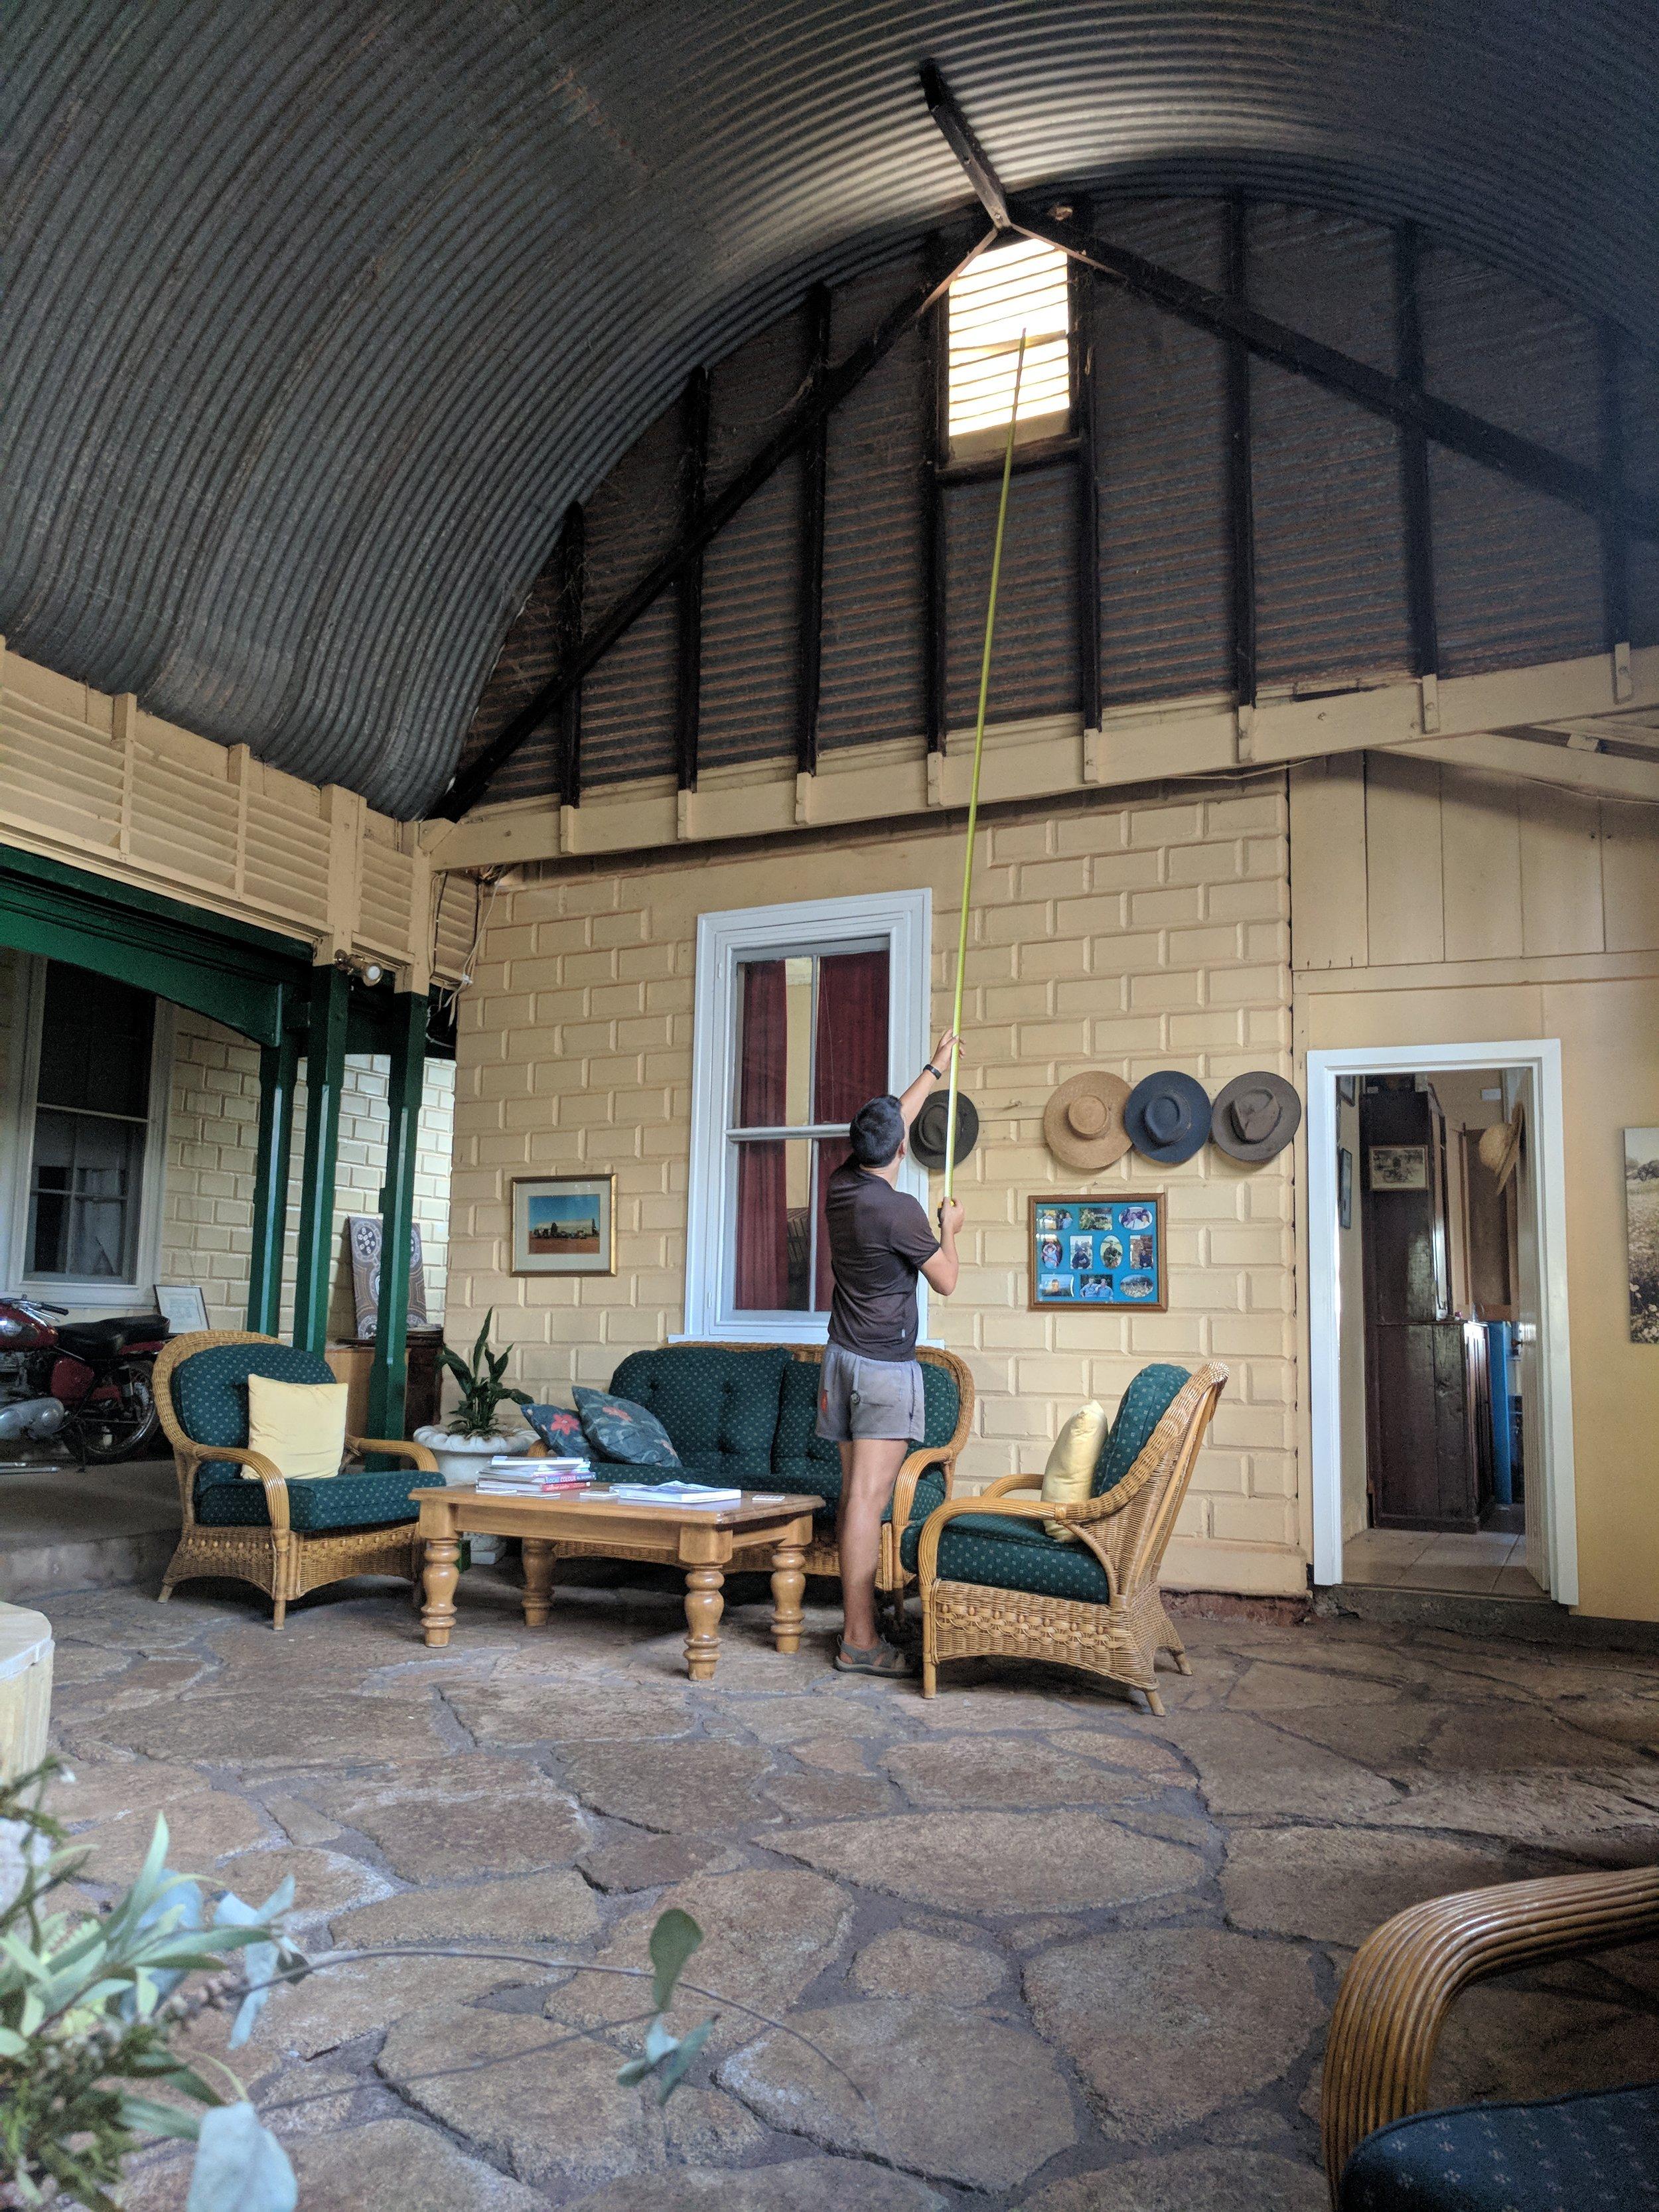 Atrium space at the homestead